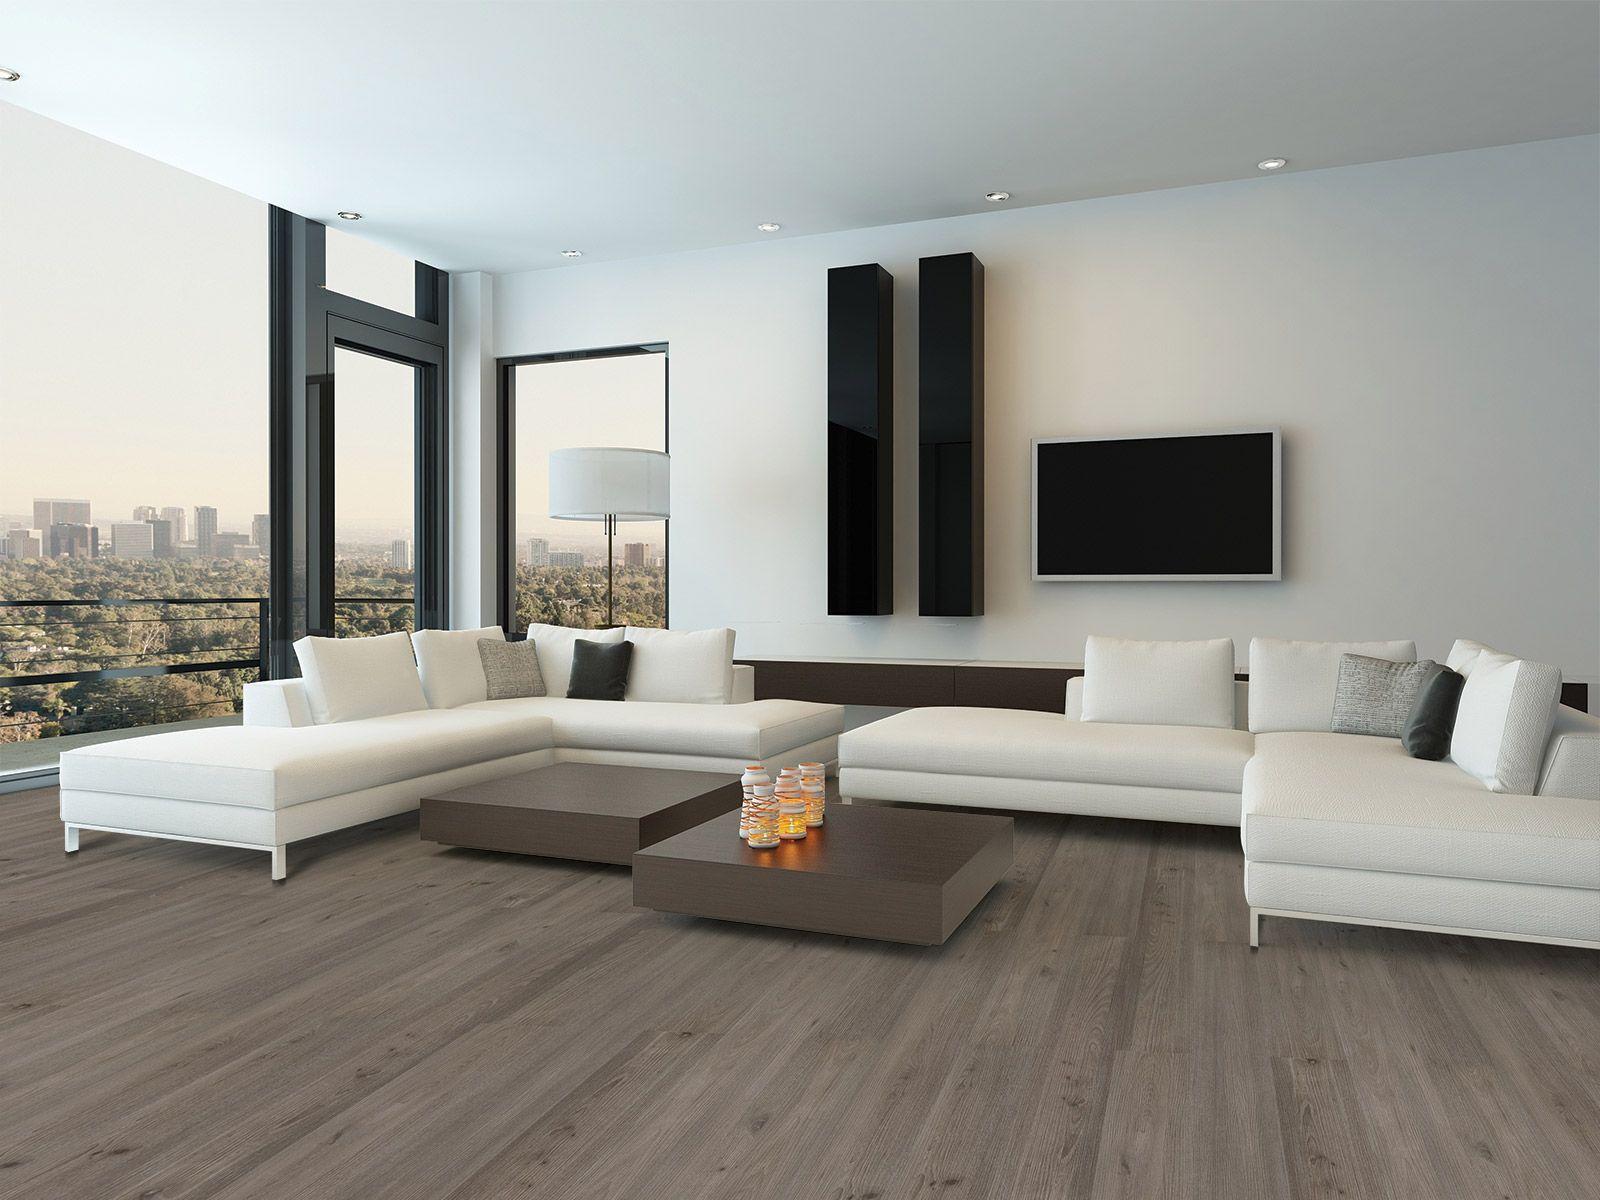 High Quality Flooring Options